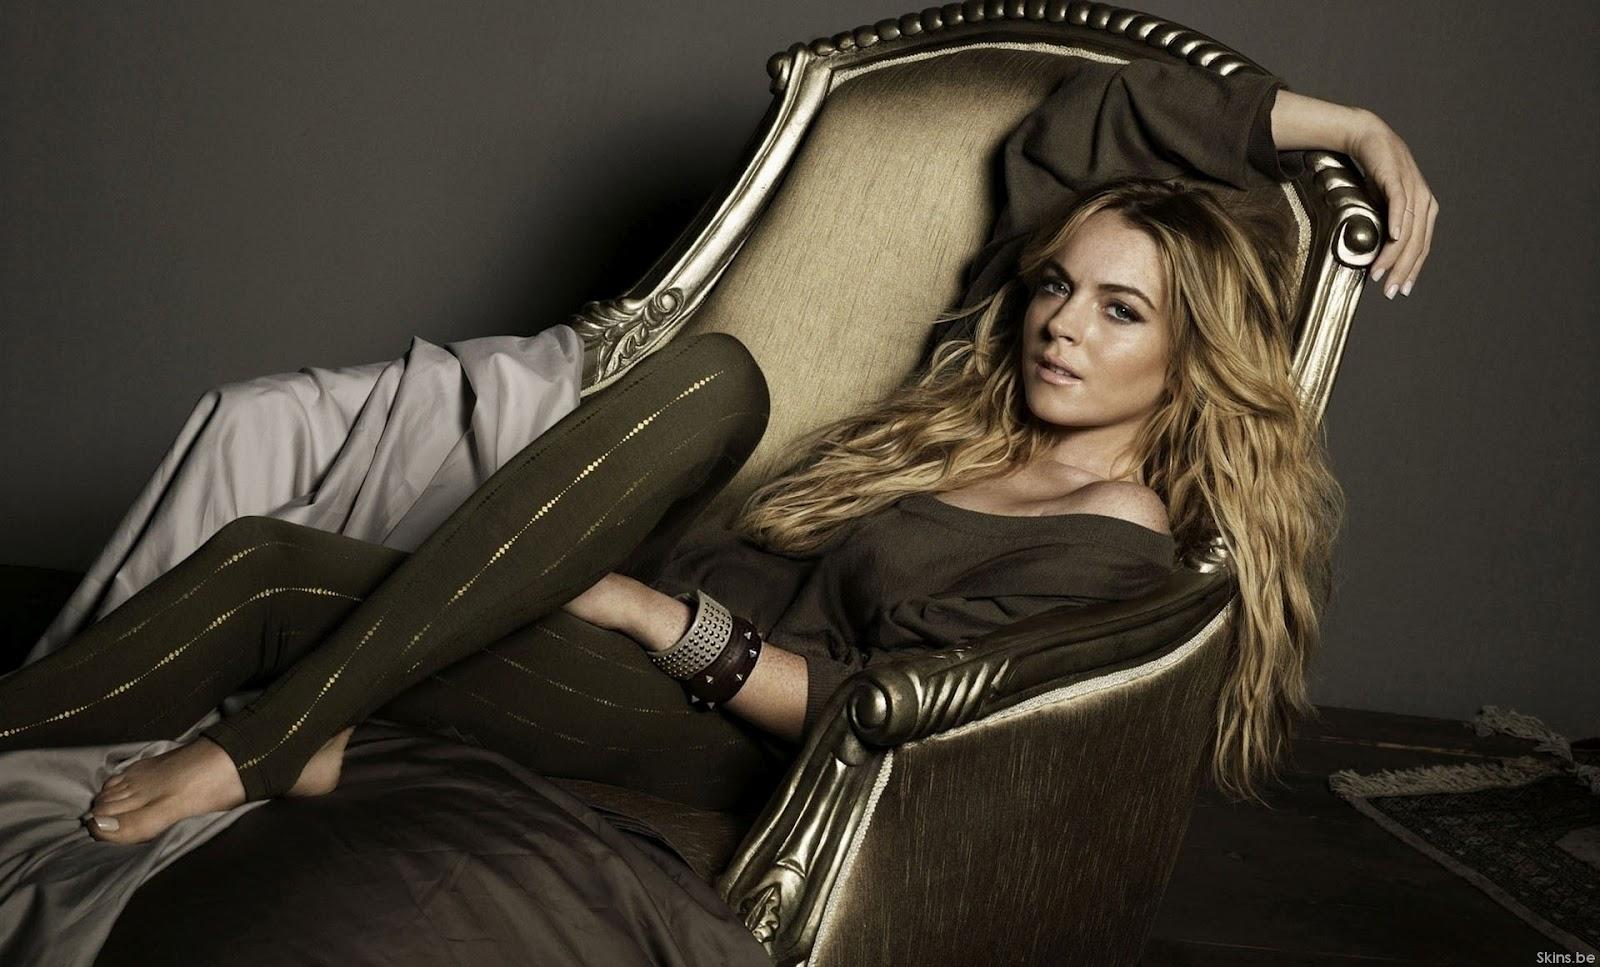 Lindsay Lohan | Lindsay lohan, Lindsay, Celebrities female